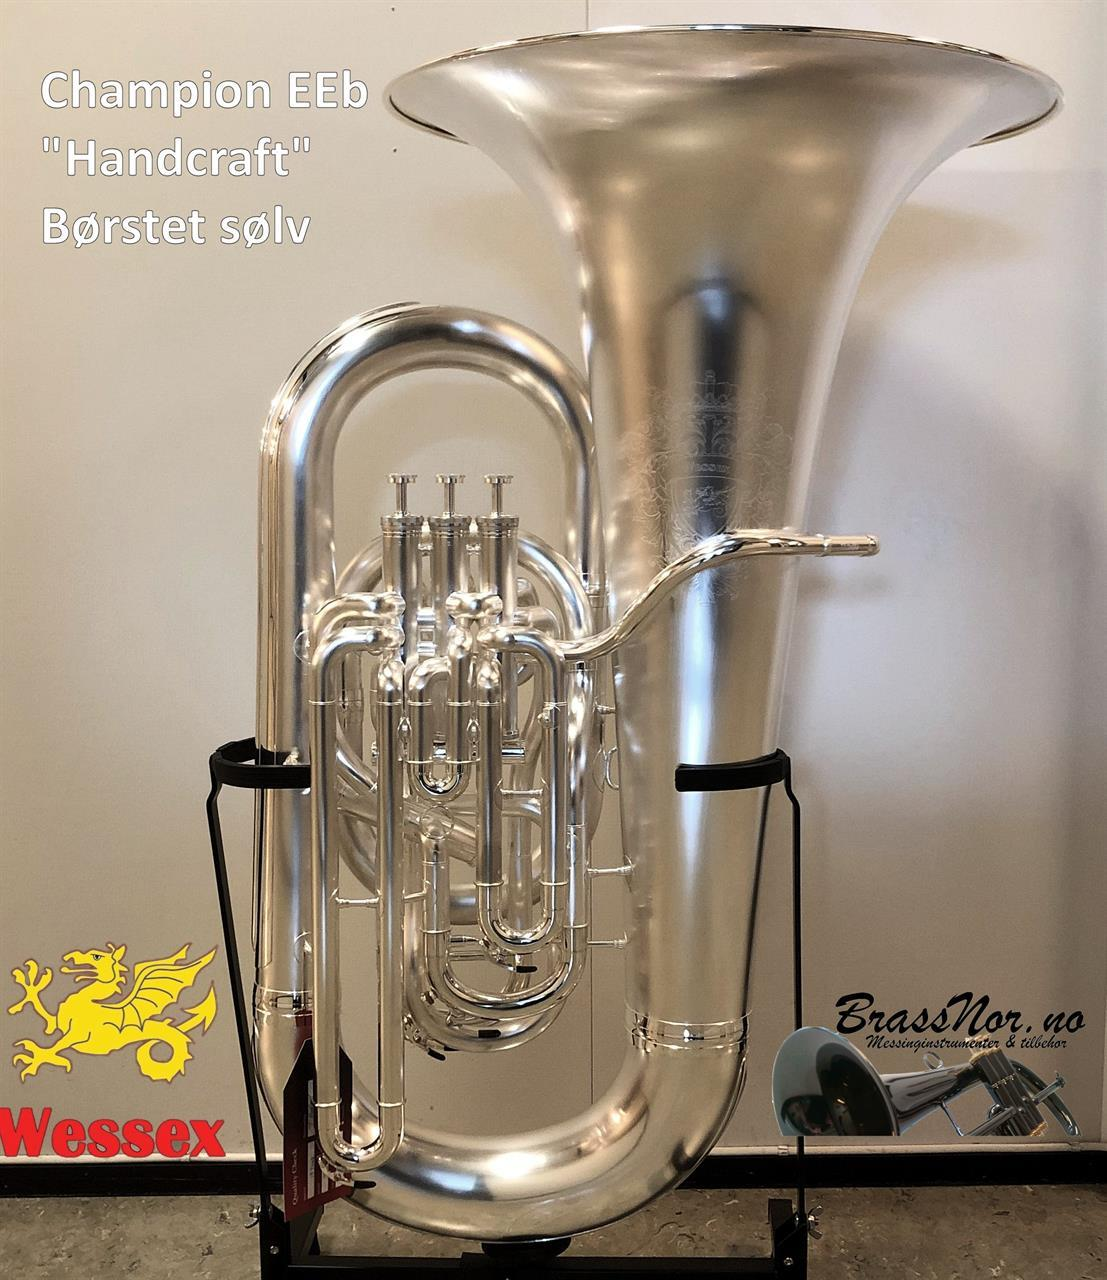 Wessex Eb-tuba Champion børstet sølv Handcraft